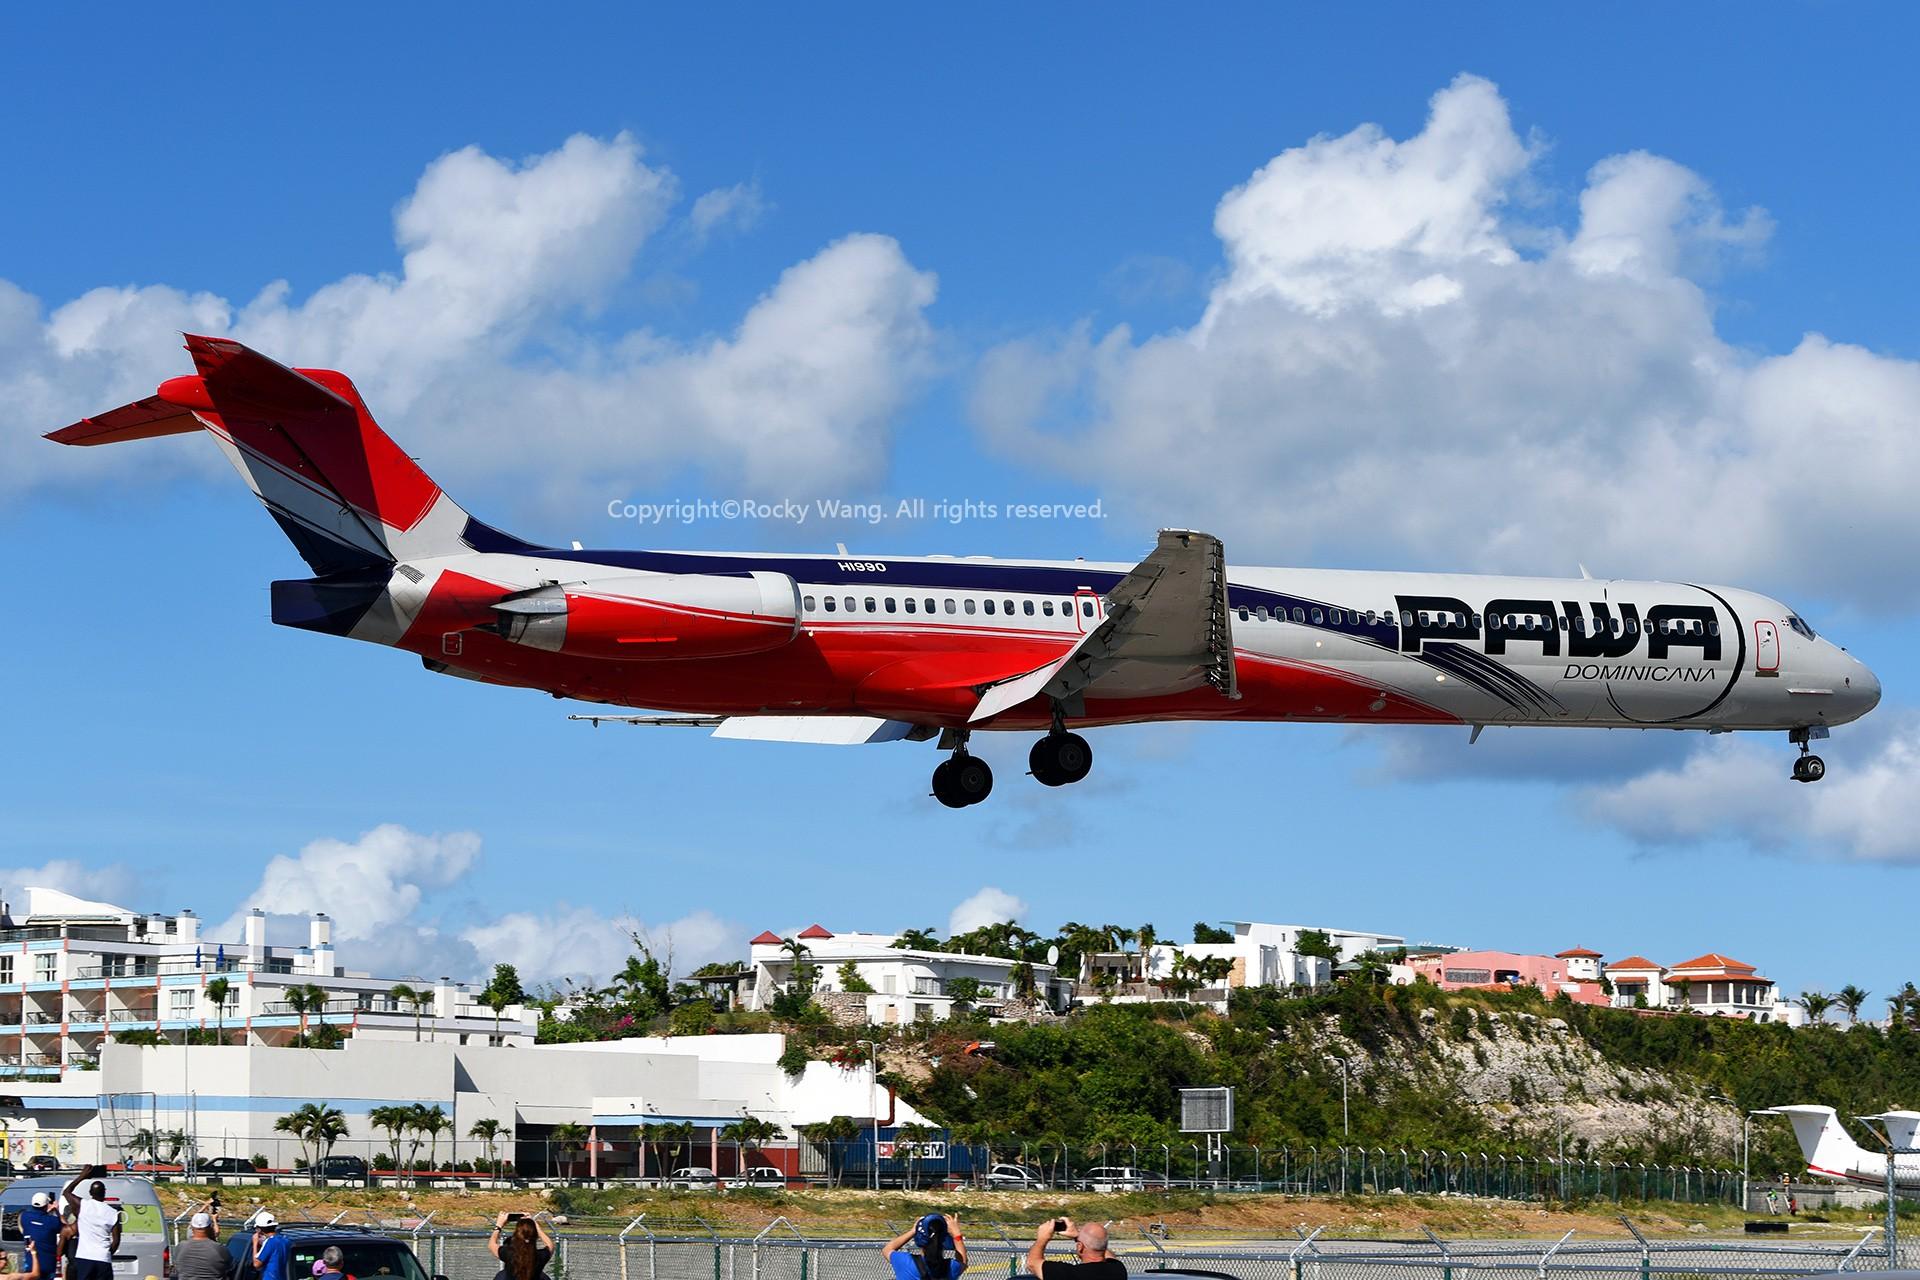 Re:[原创]My endless Caribbean dream——圣马丁朱莉安娜公主机场拍机记 MCDONNELL DOUGLAS MD-83 HI990 荷属安的列斯群岛朱利安娜公主机场